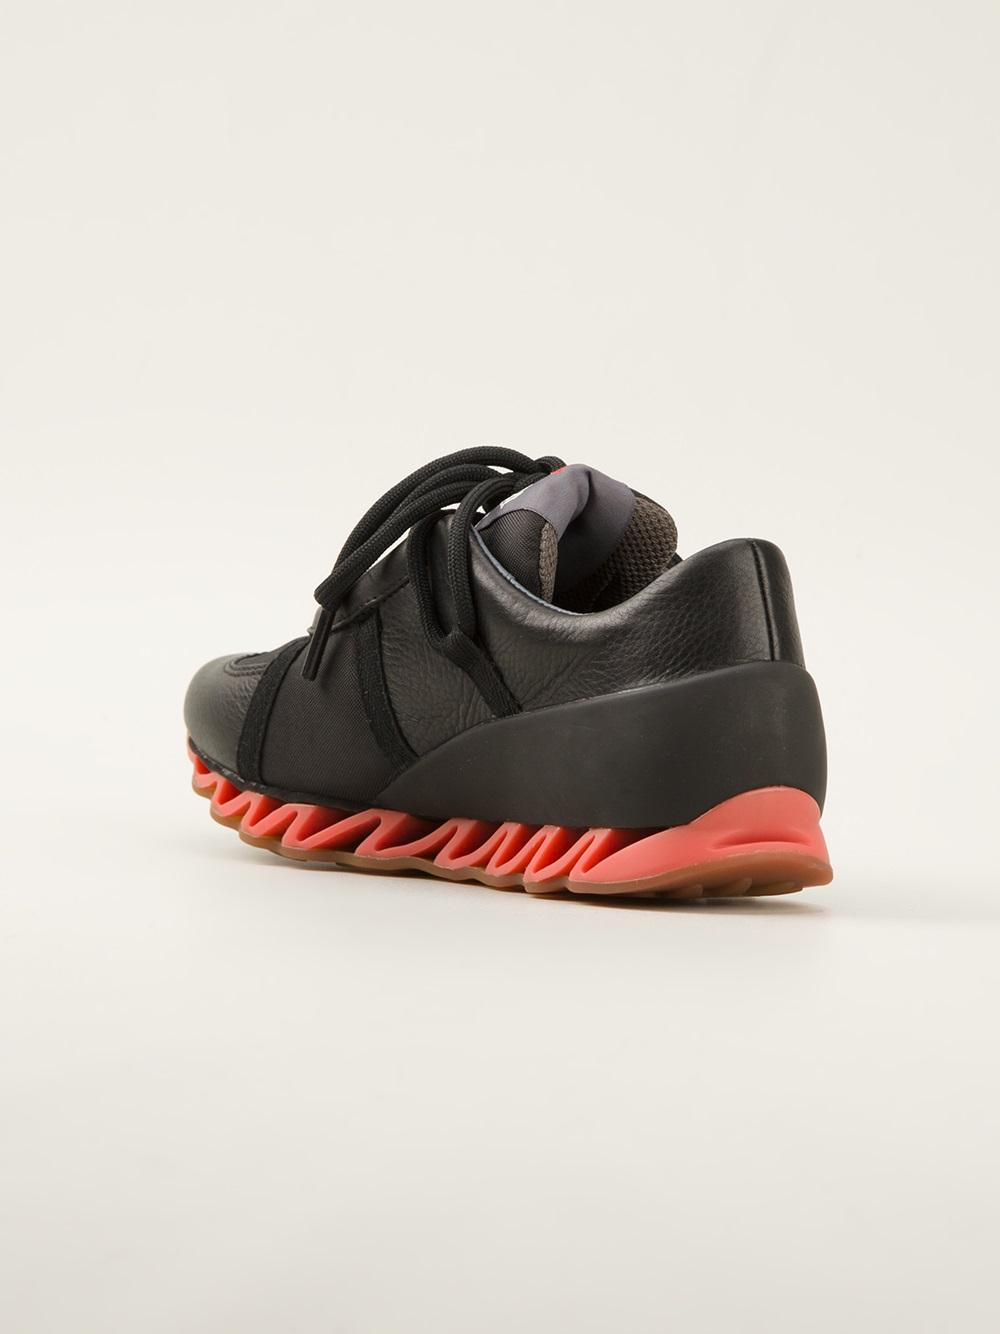 Bernhard Willhelm Himalayan Leather Sneakers in Black